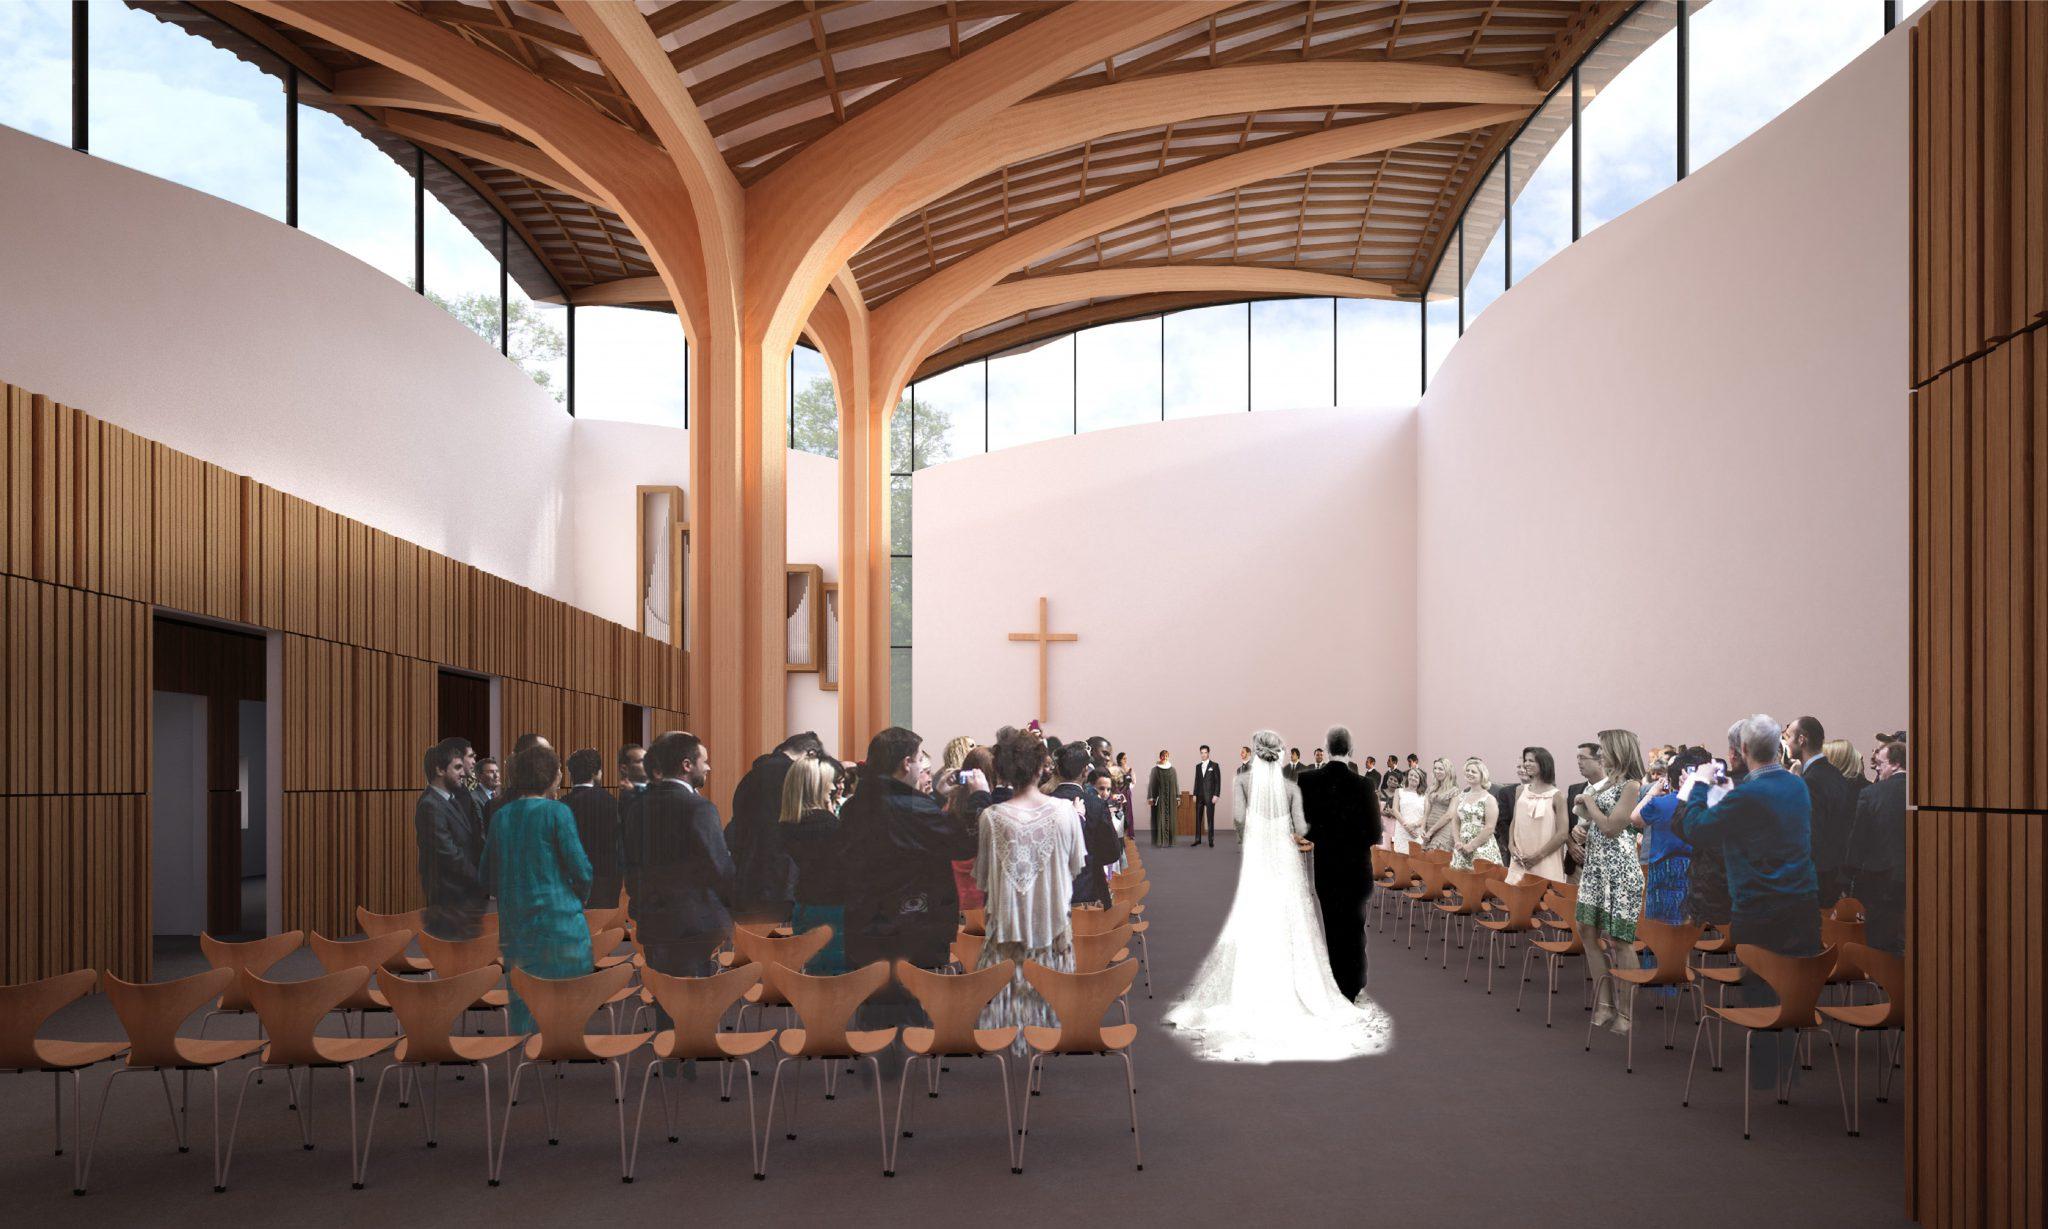 Hatlehol Church